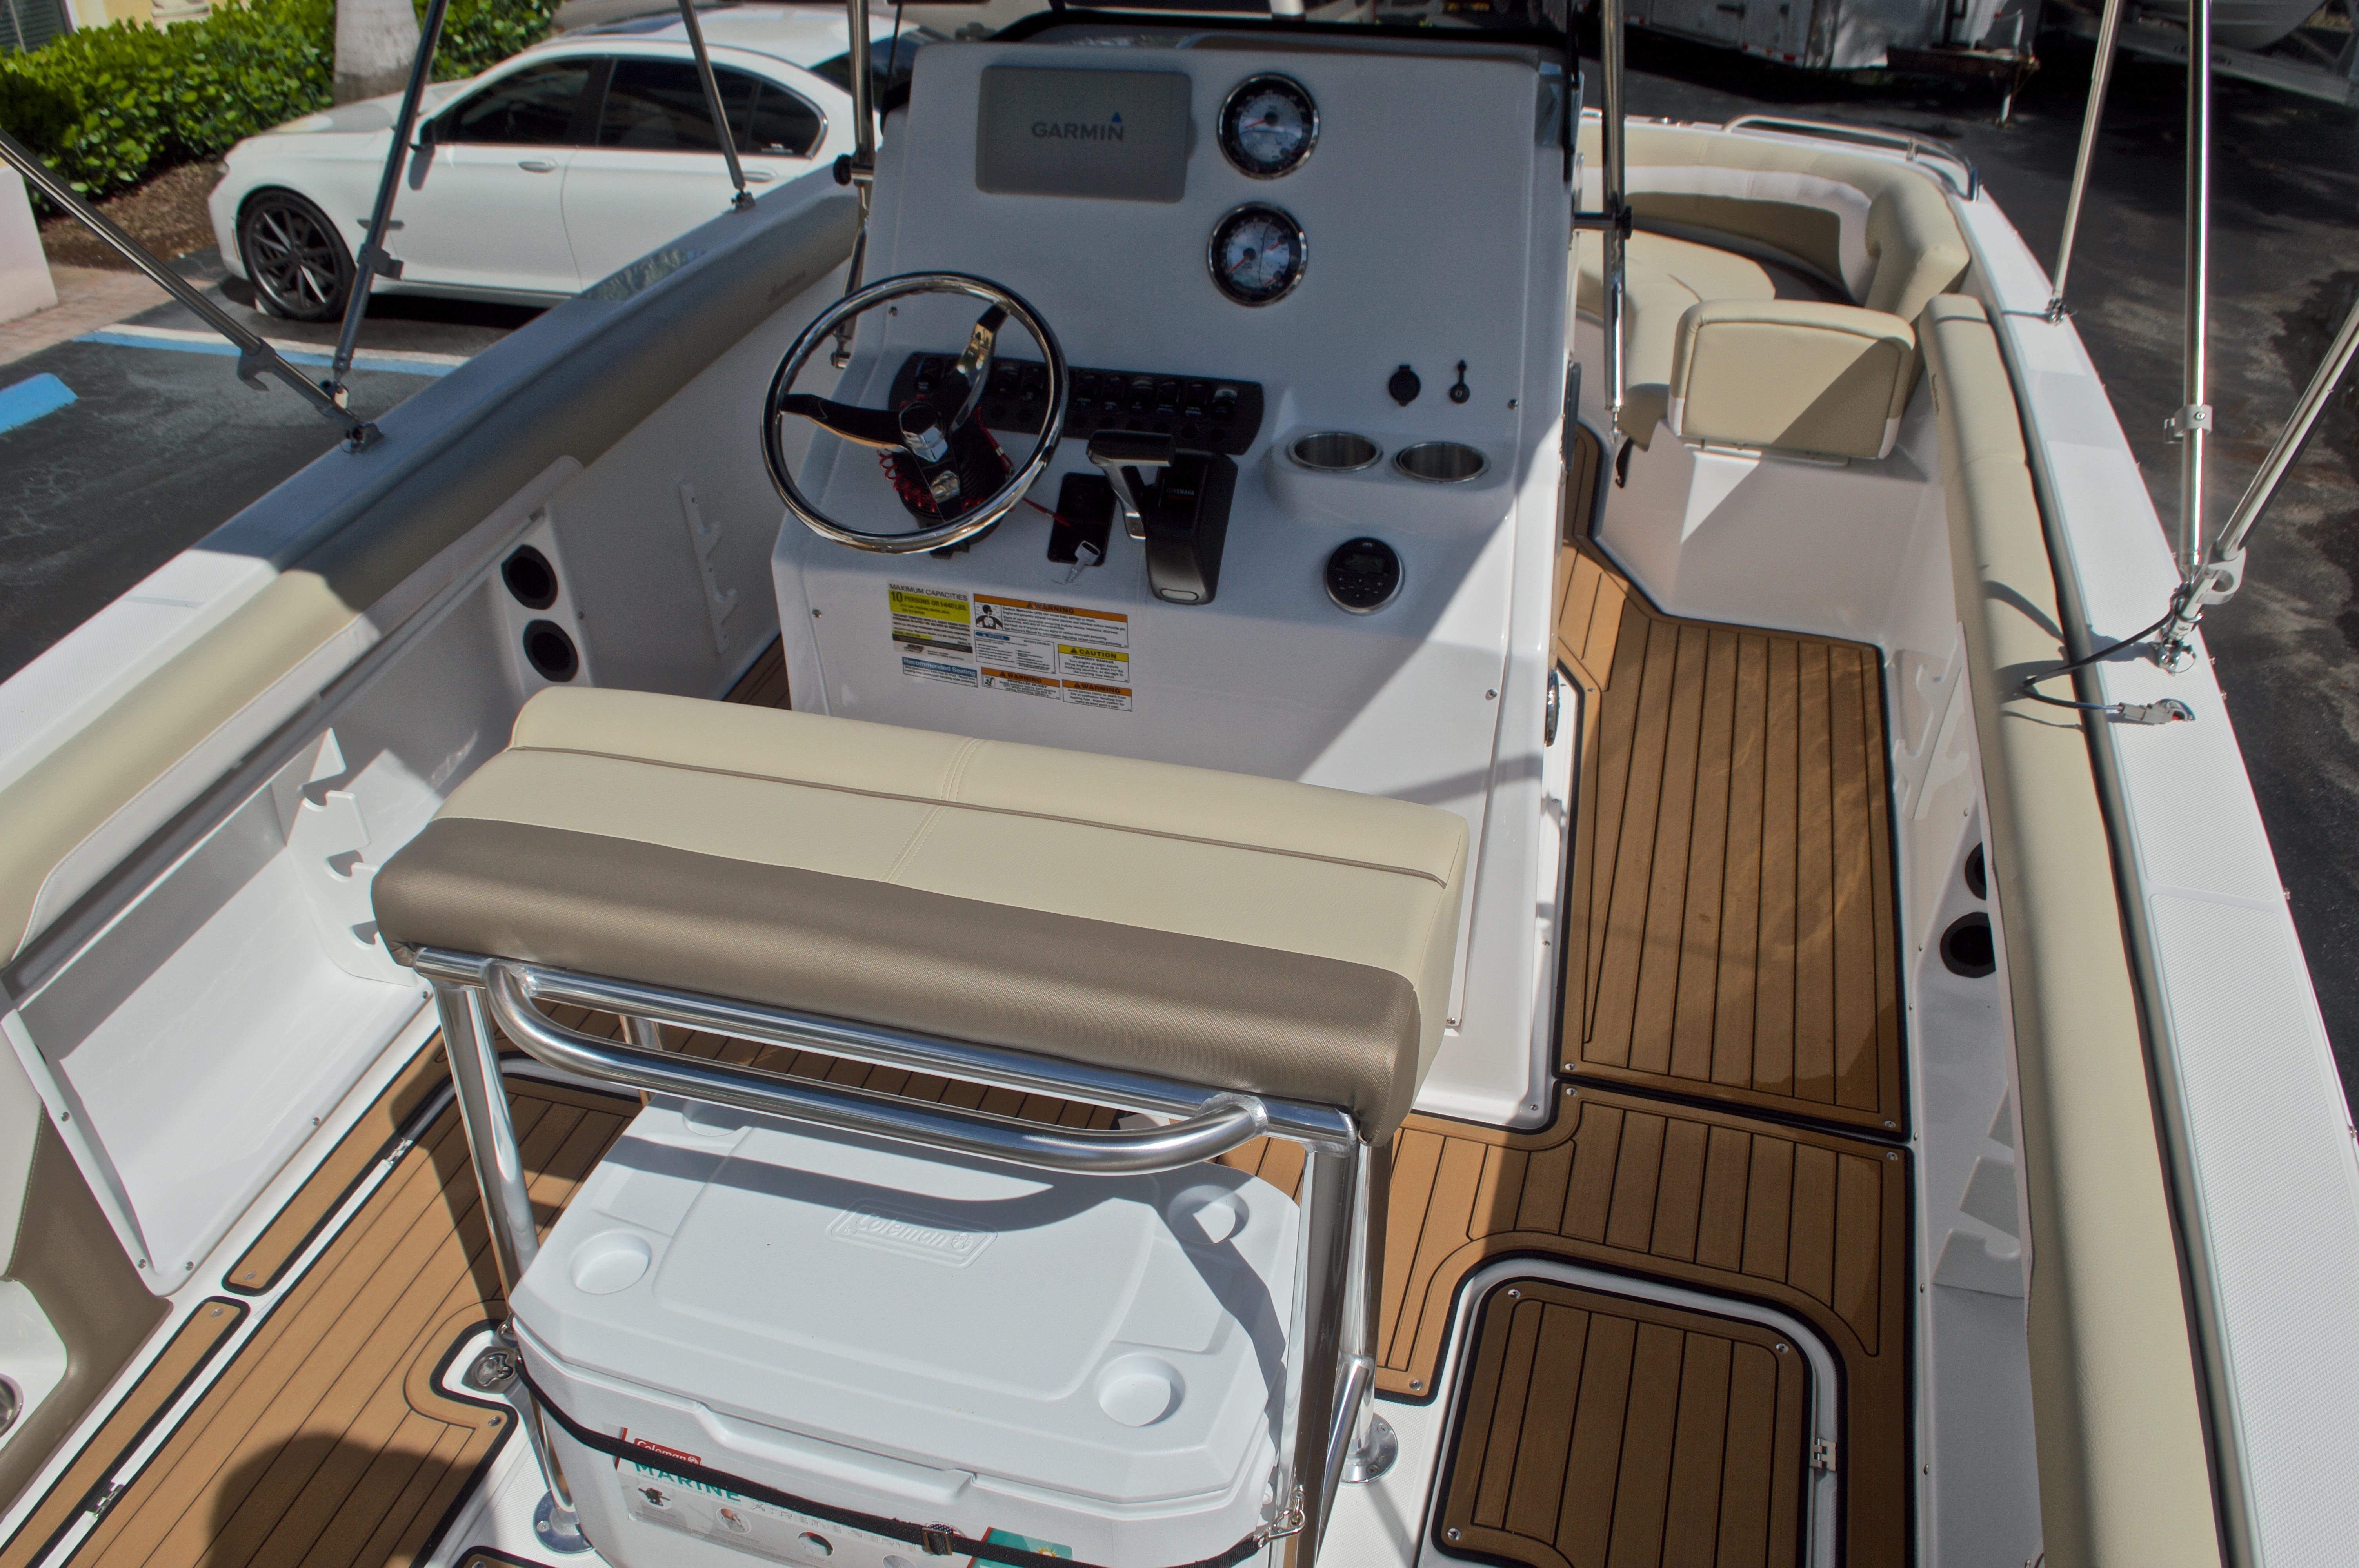 Thumbnail 9 for New 2017 Hurricane CC21 Center Console boat for sale in Vero Beach, FL